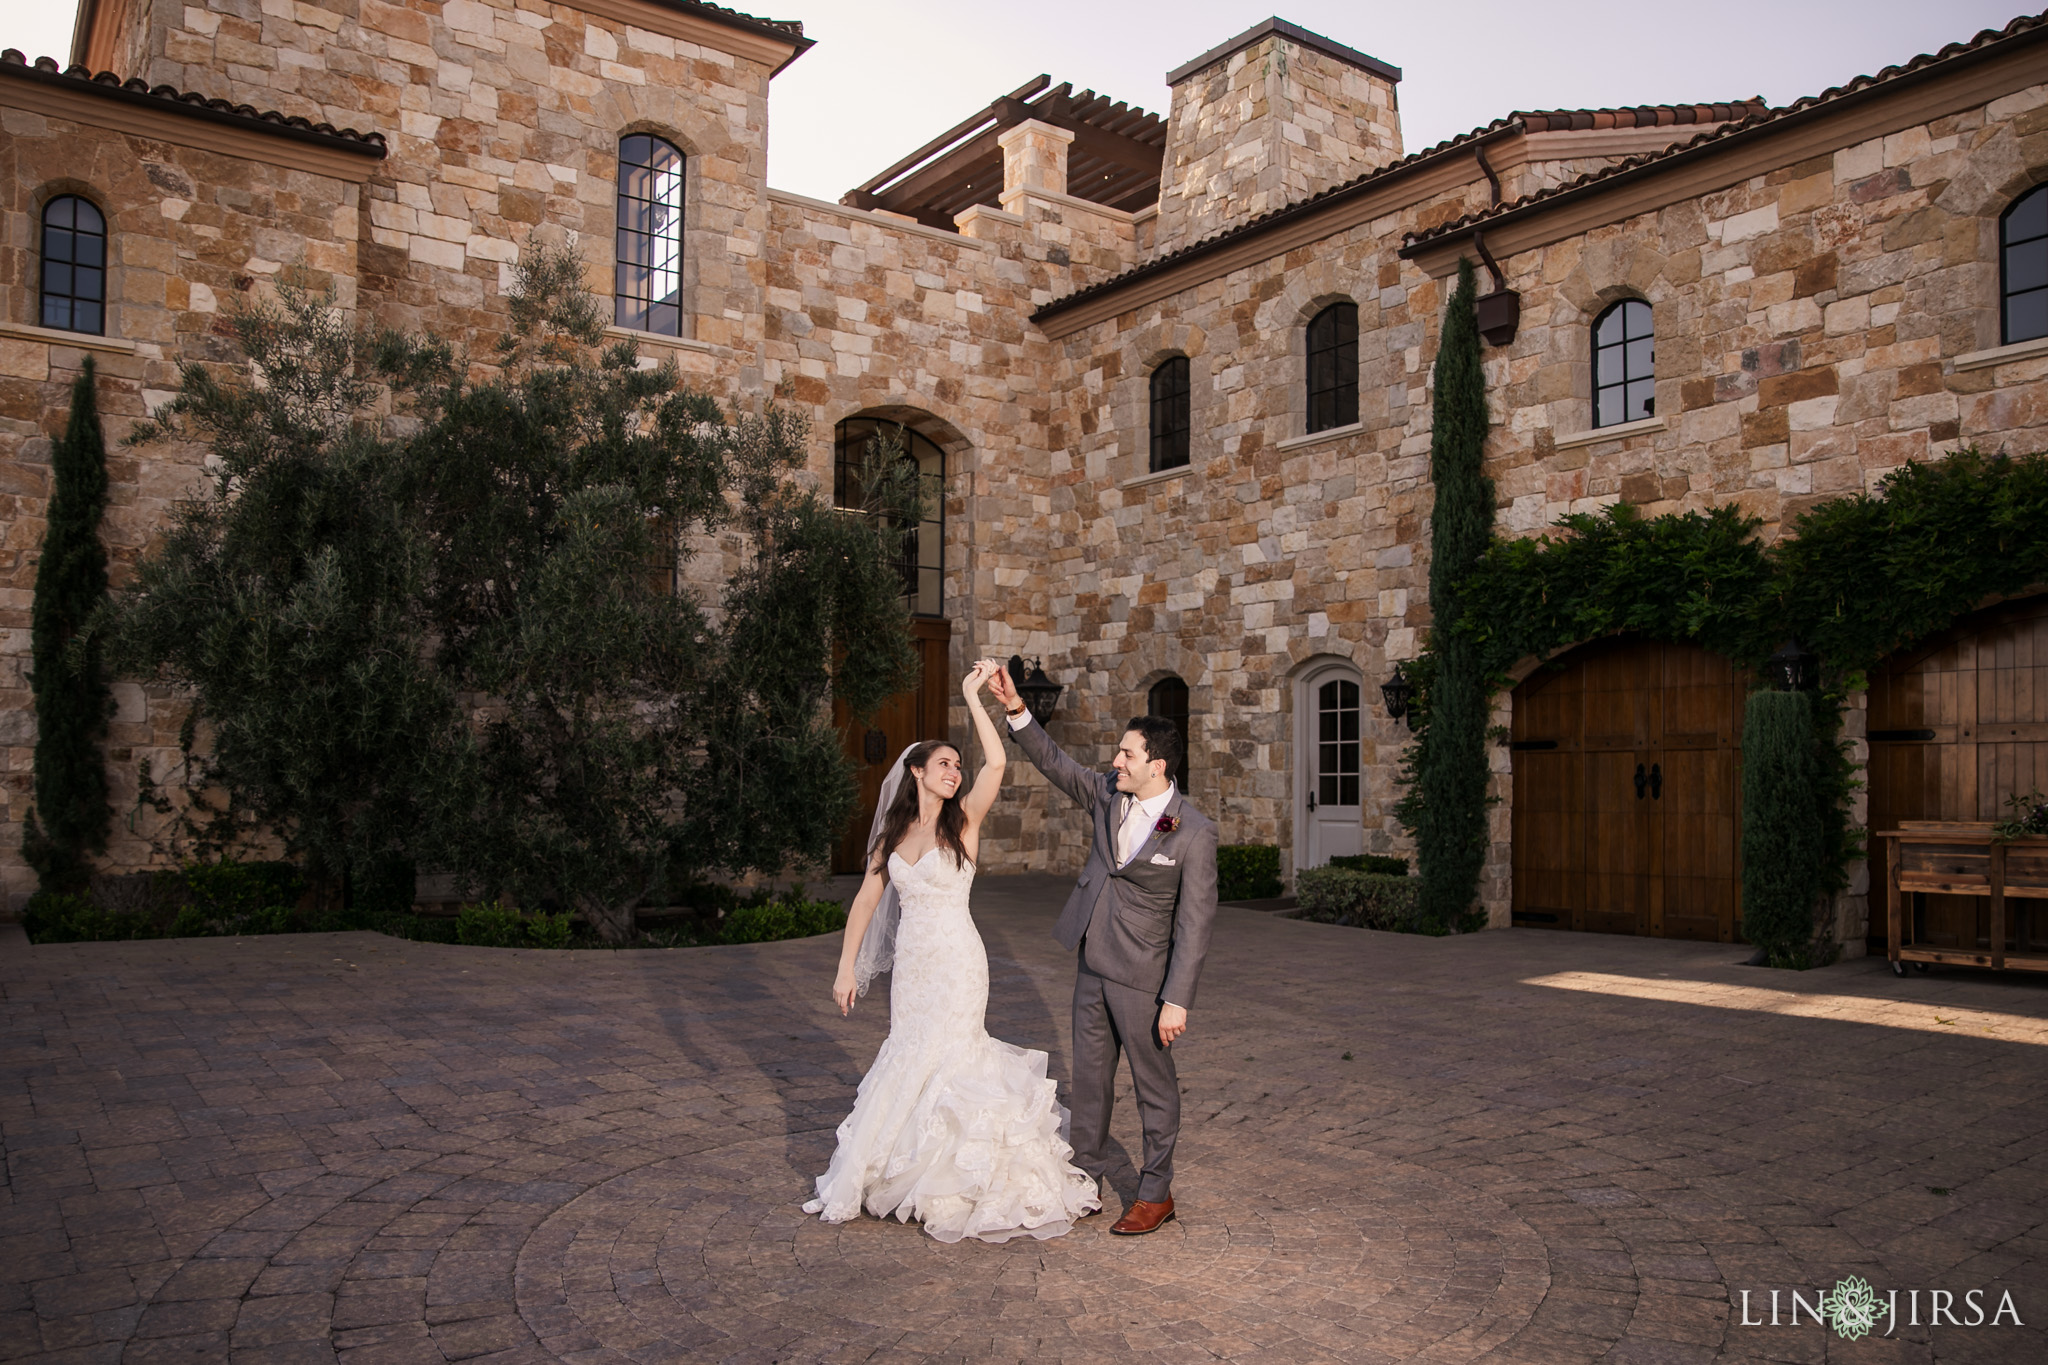 011 malibu rocky oaks wedding photography